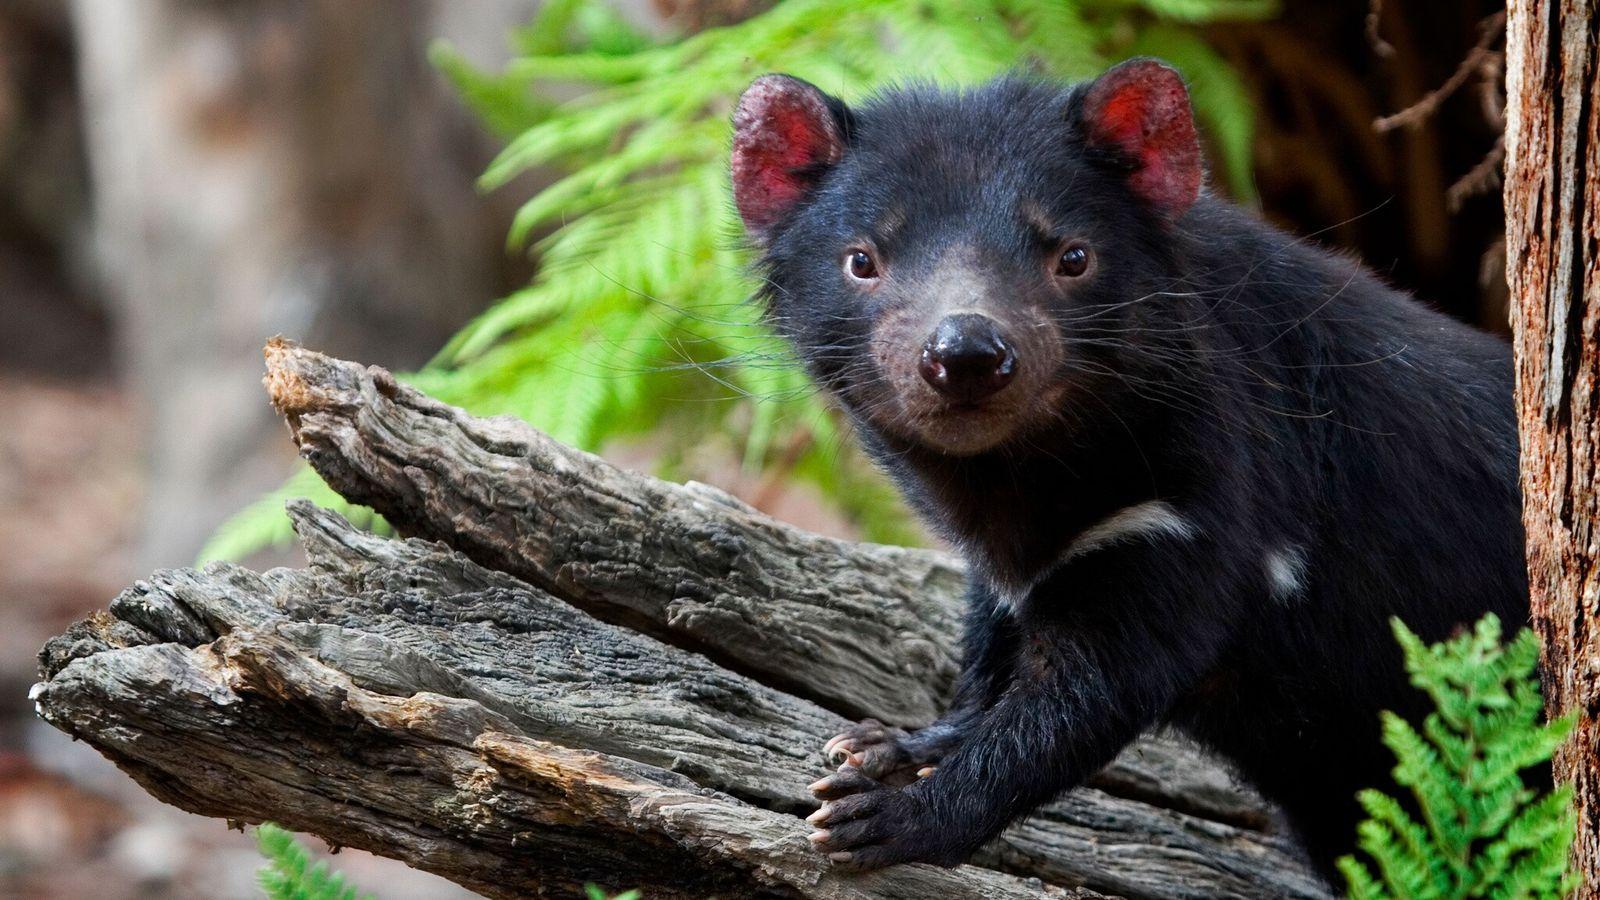 A captive Tasmanian devil poses on a log at the Something Wild Animal Sanctuary in Tasmania ...